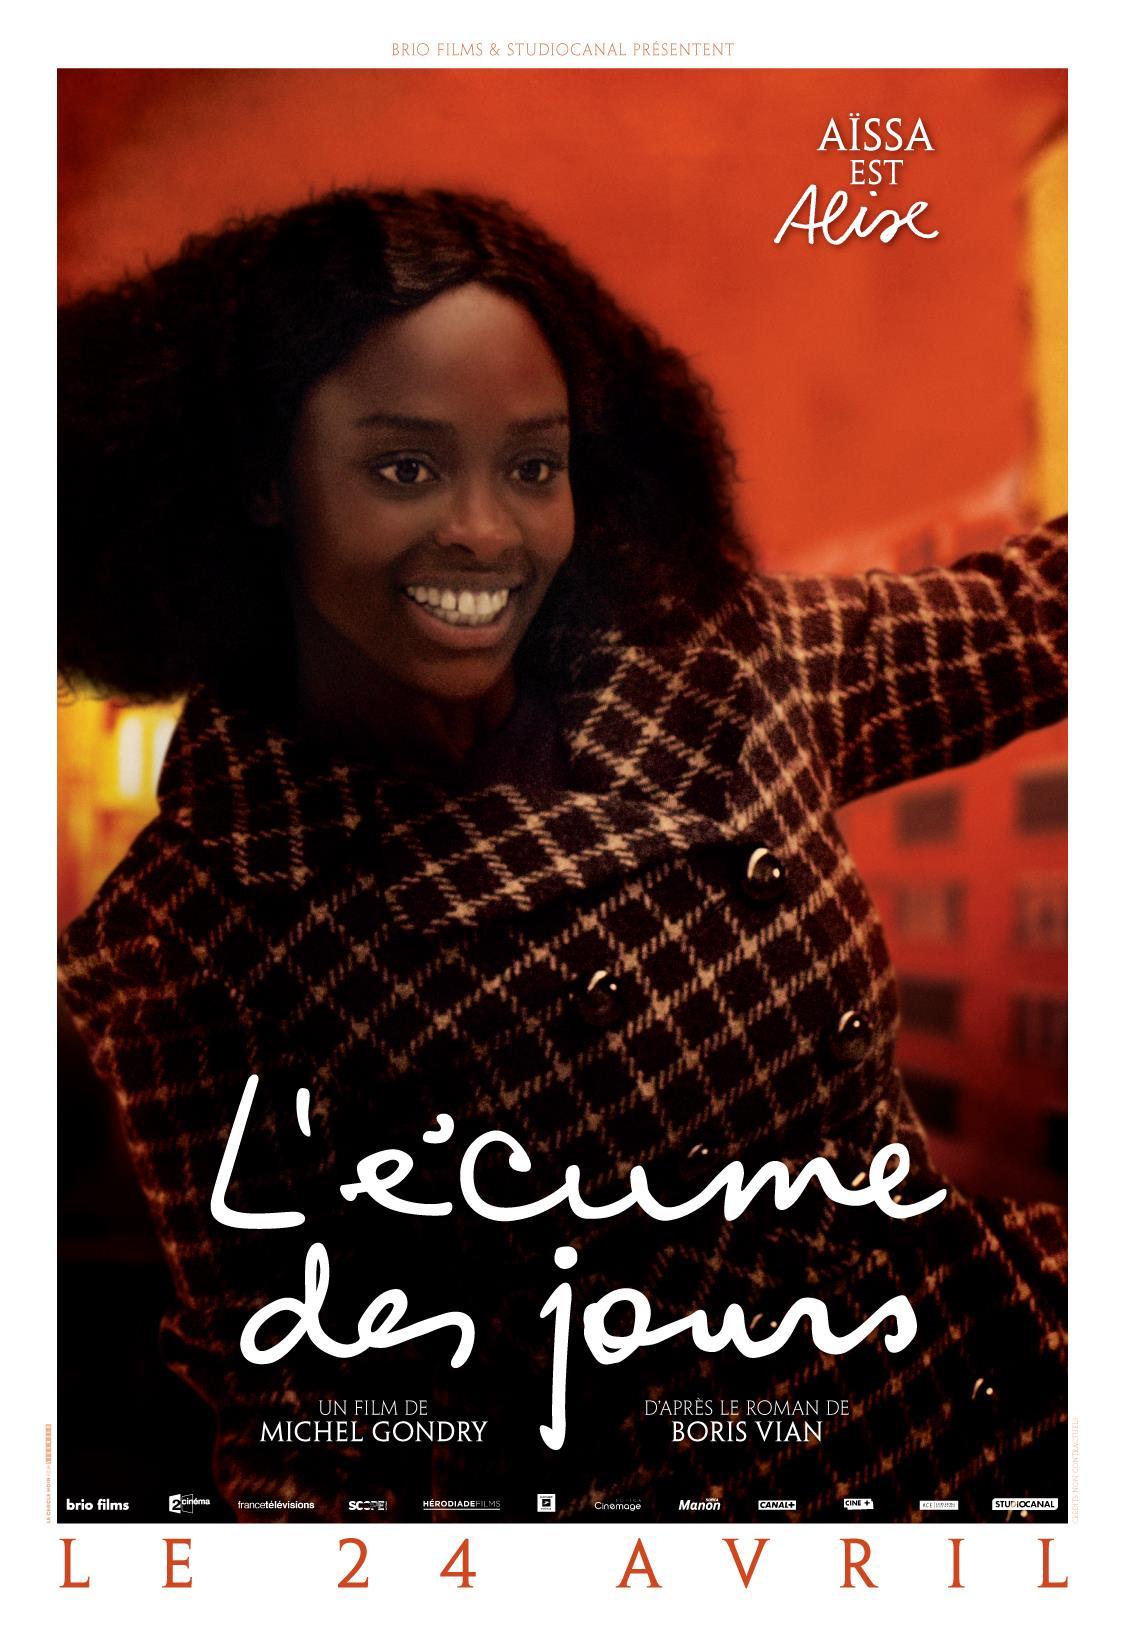 плакат фильма характер-постер Пена дней